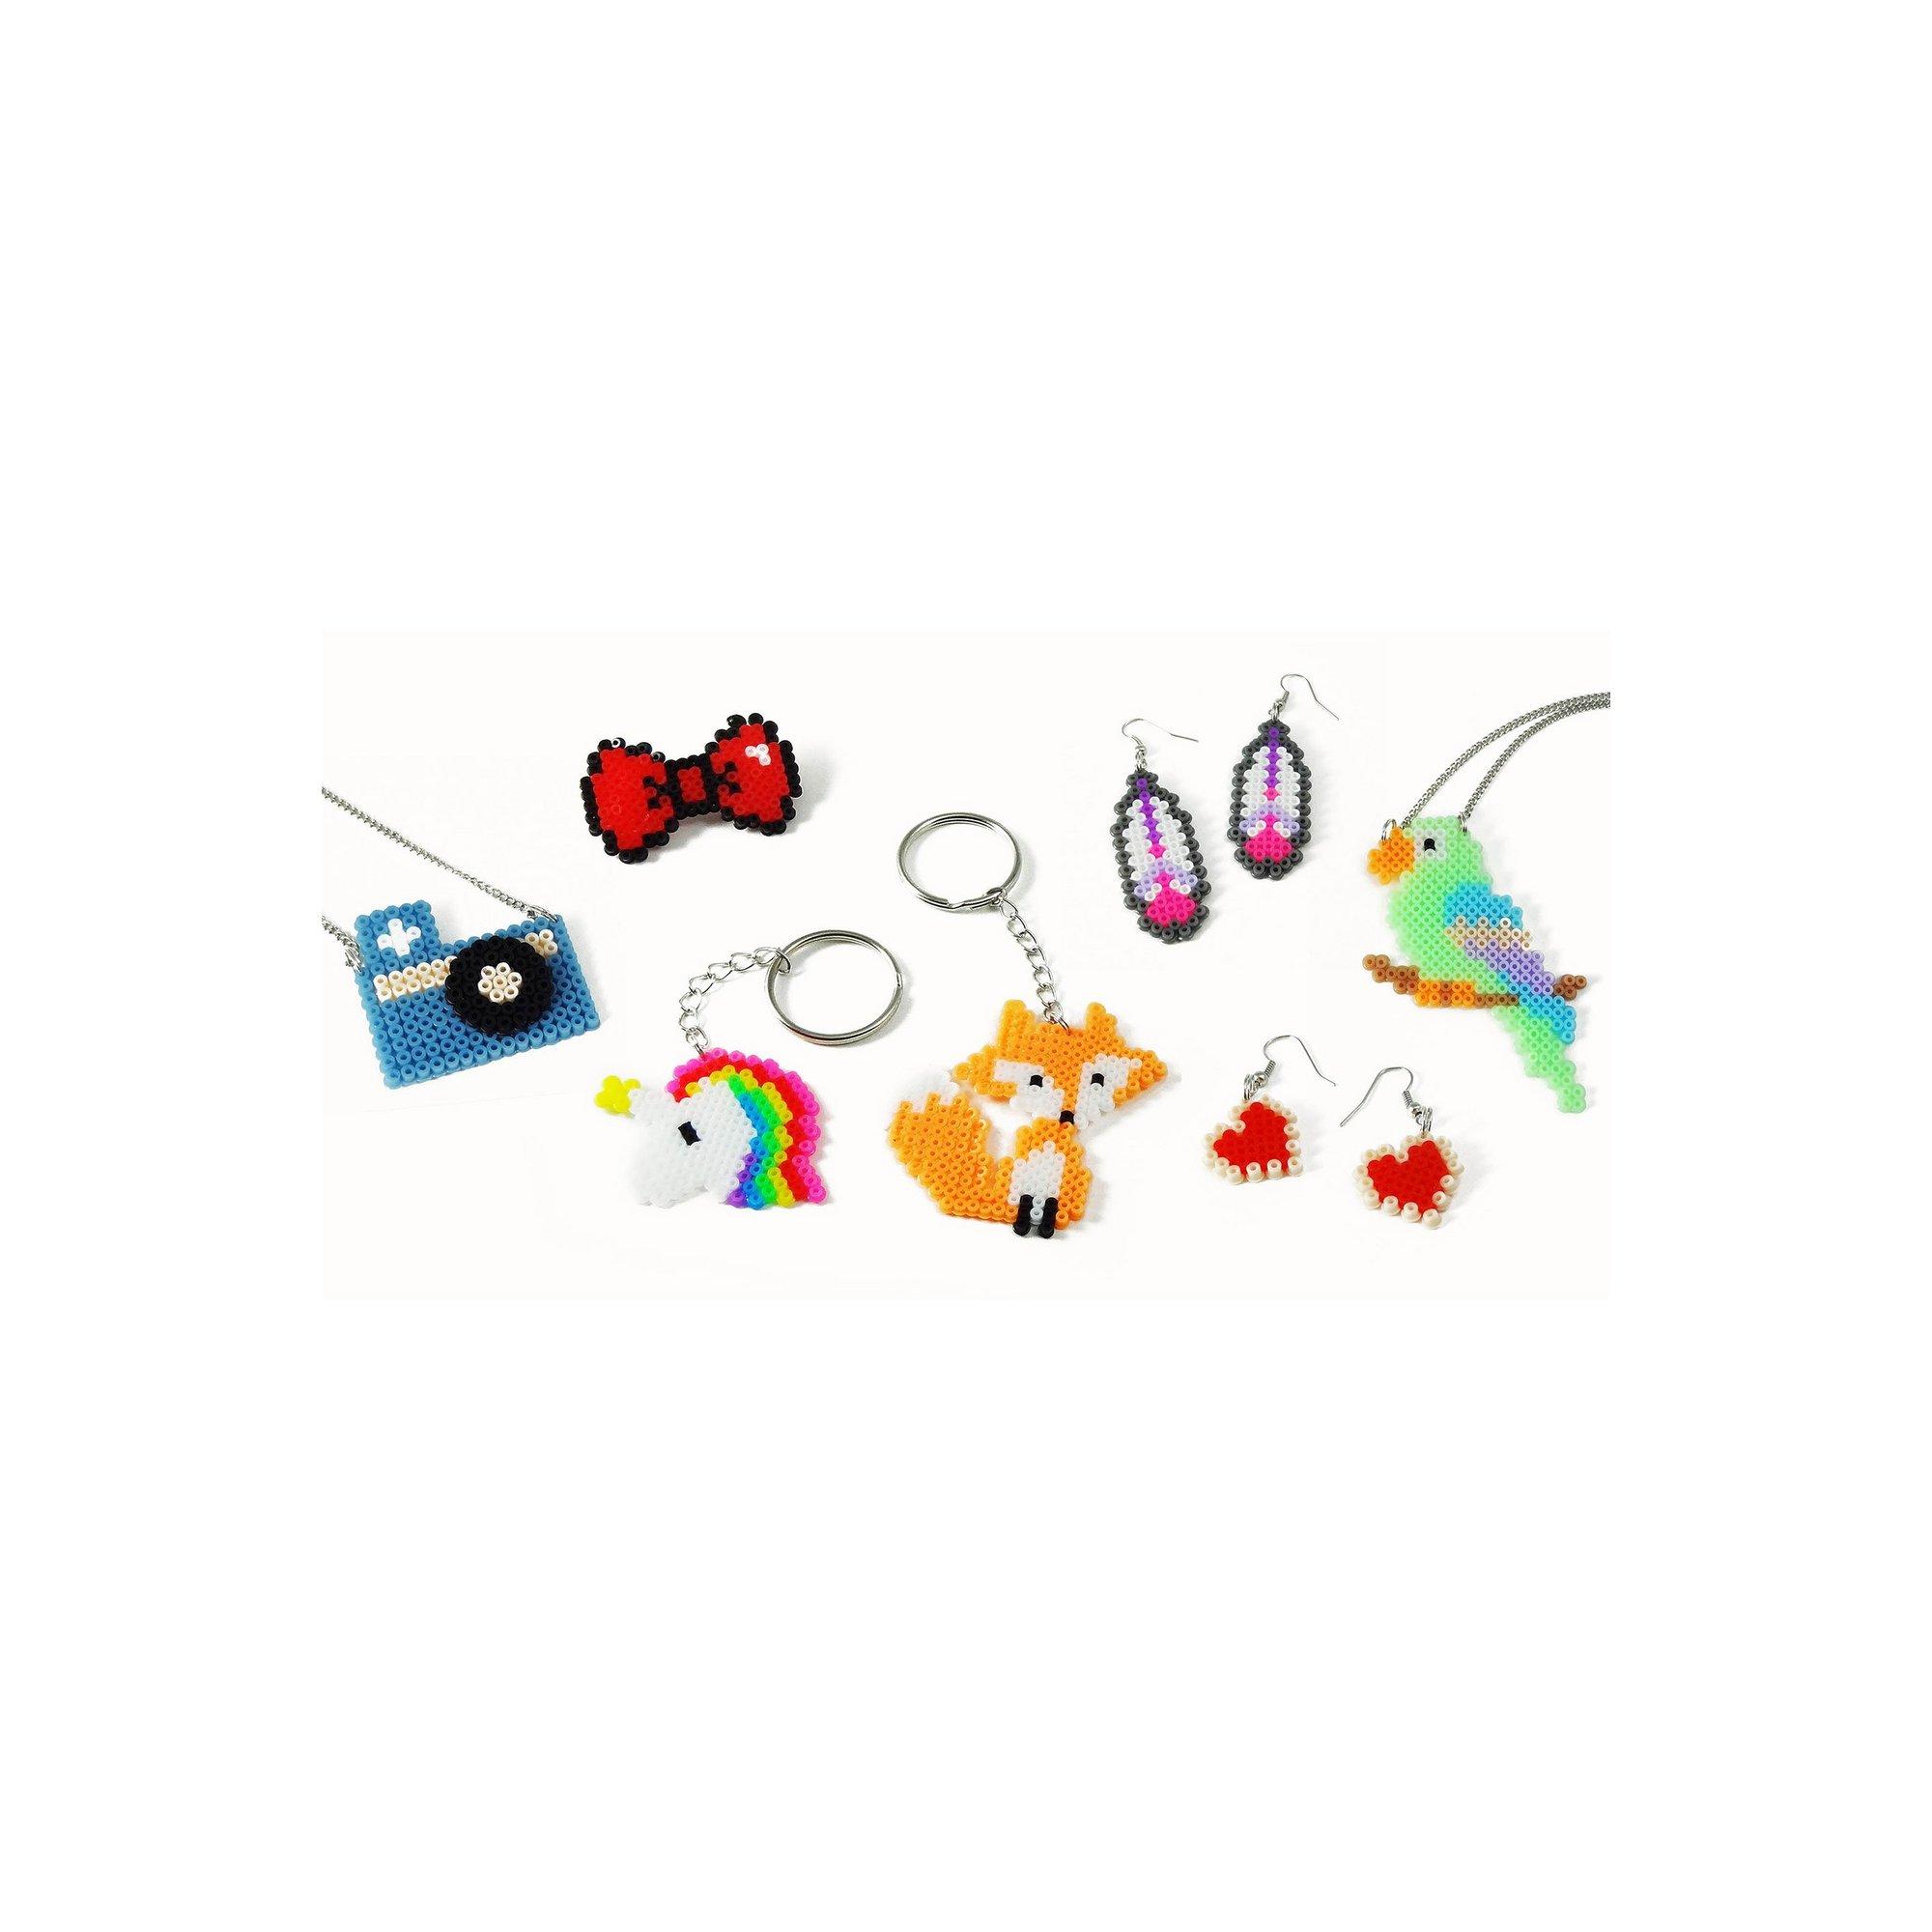 Image of Be Teens Pixel Jewellery Set